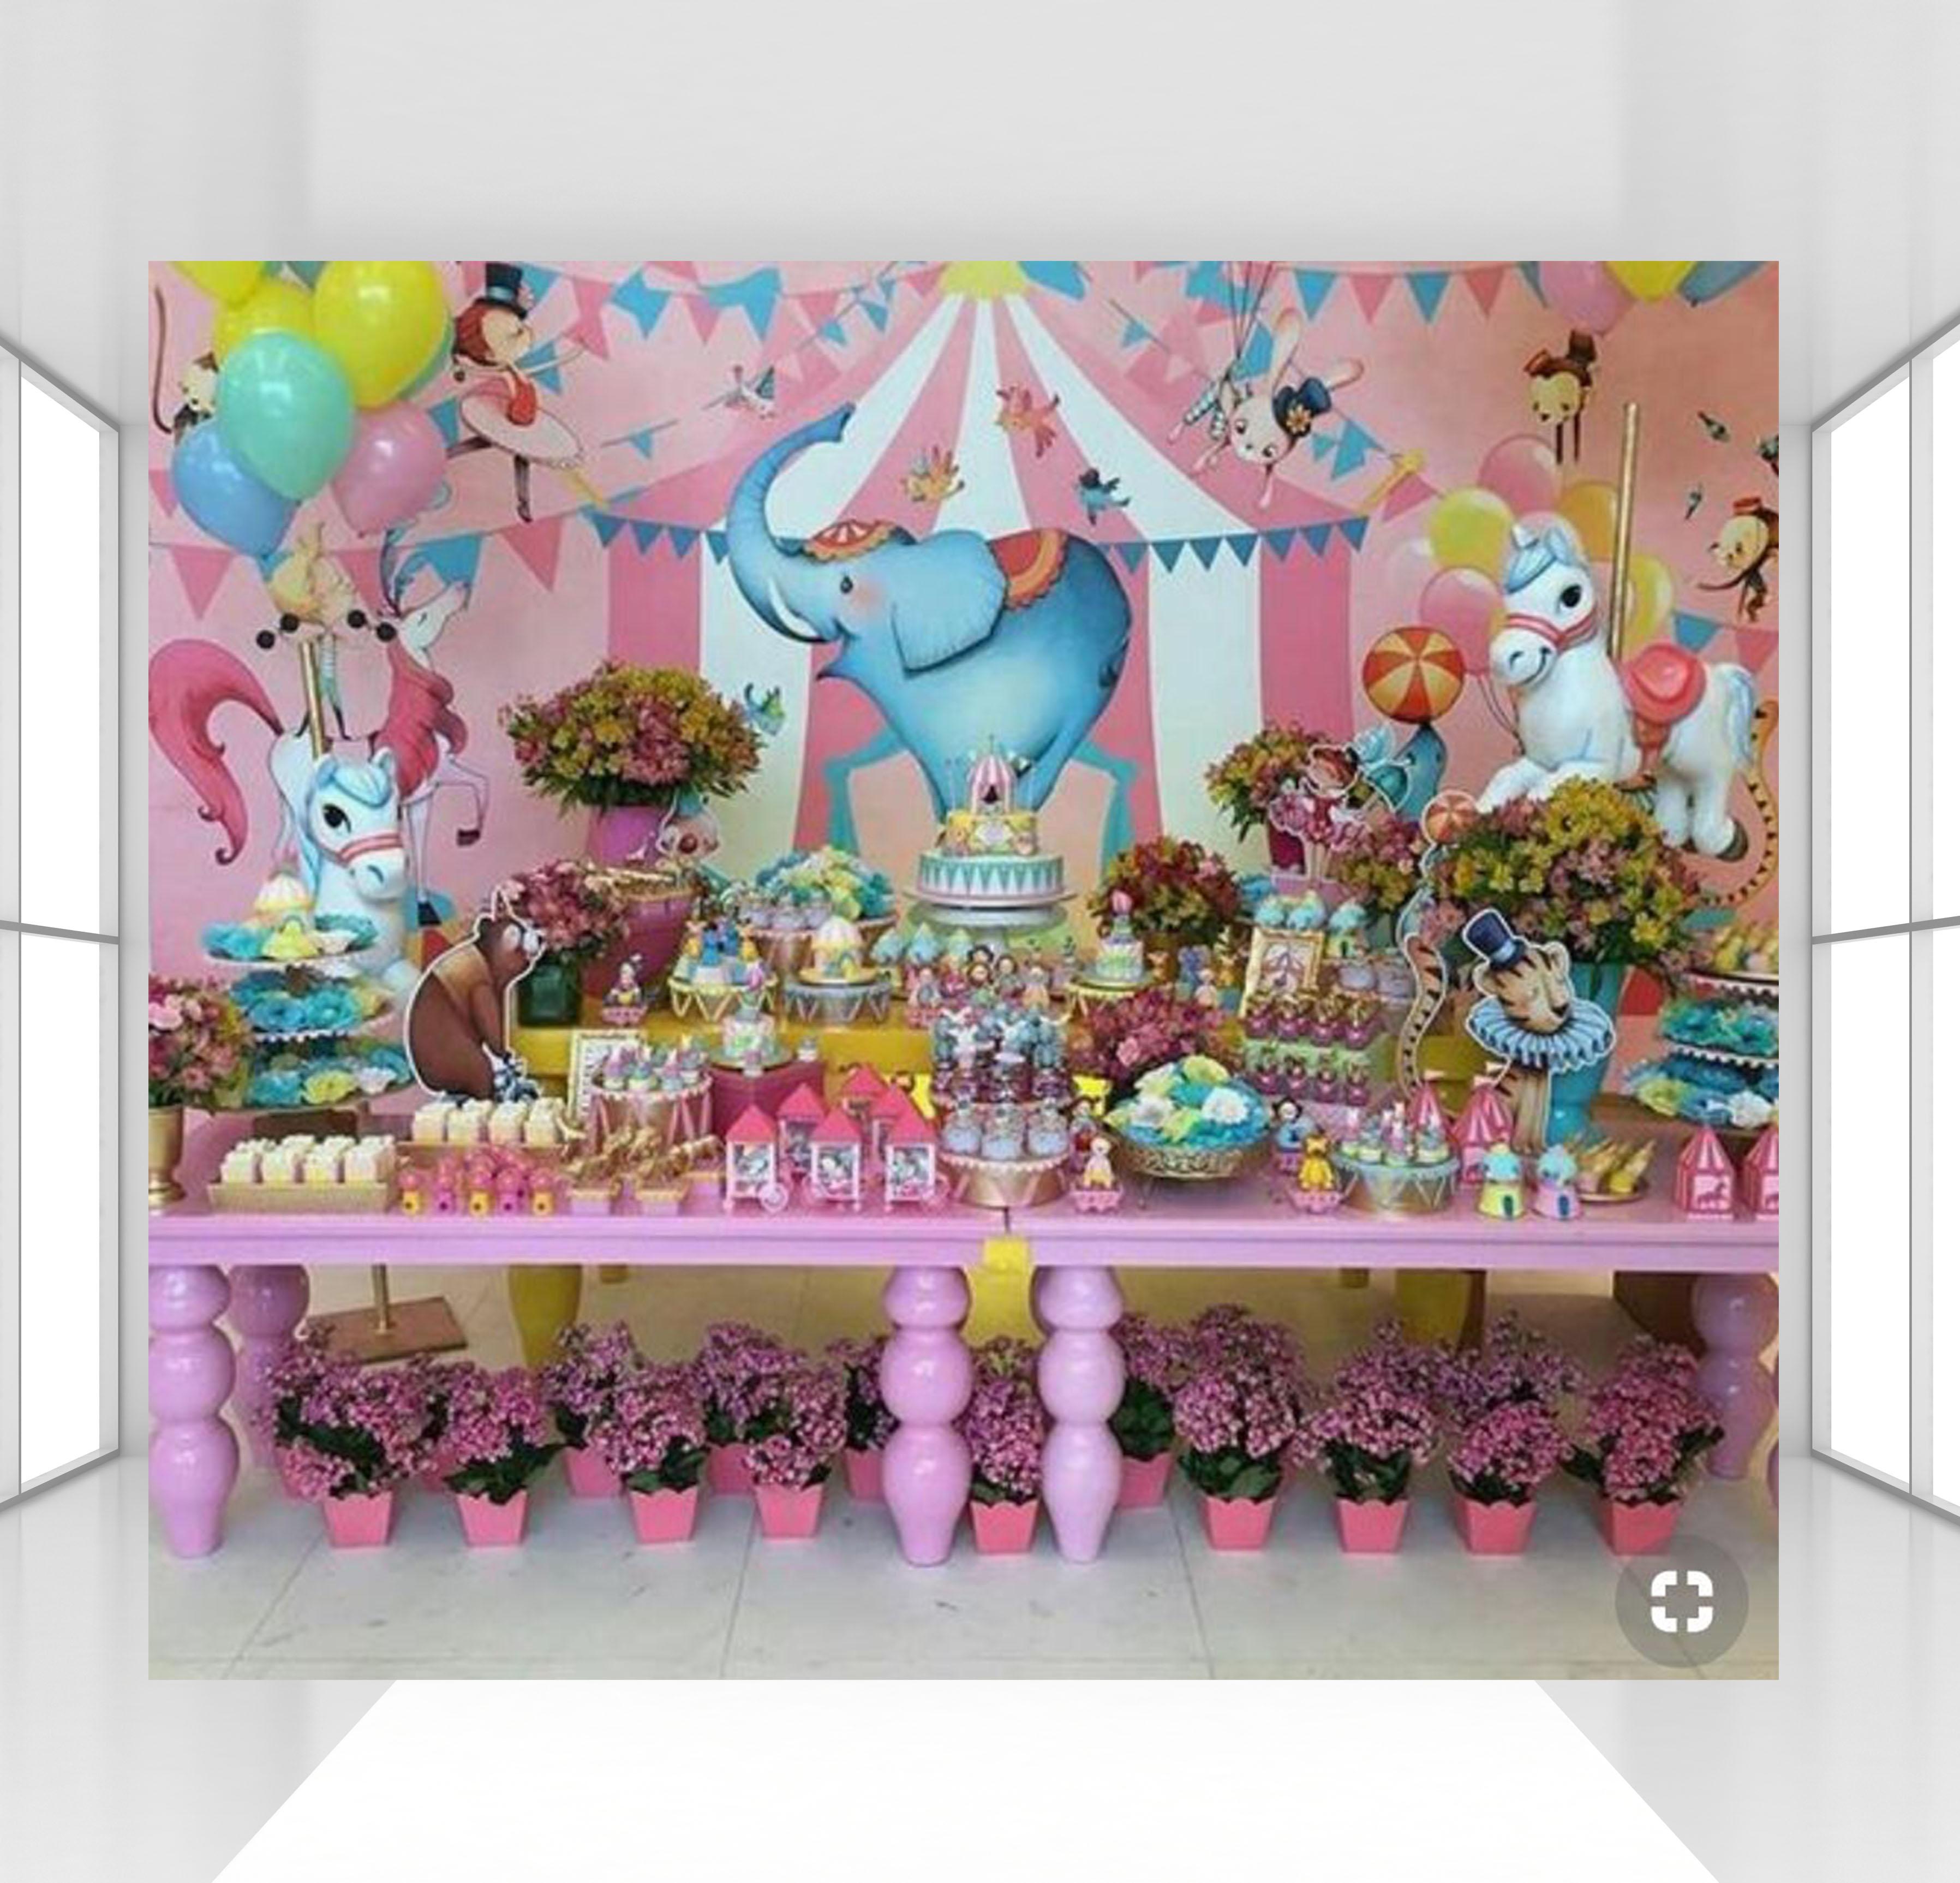 Enjoyable Circo Circus Theme Birthday Party Backdrop Photocall Photography Personalised Birthday Cards Paralily Jamesorg